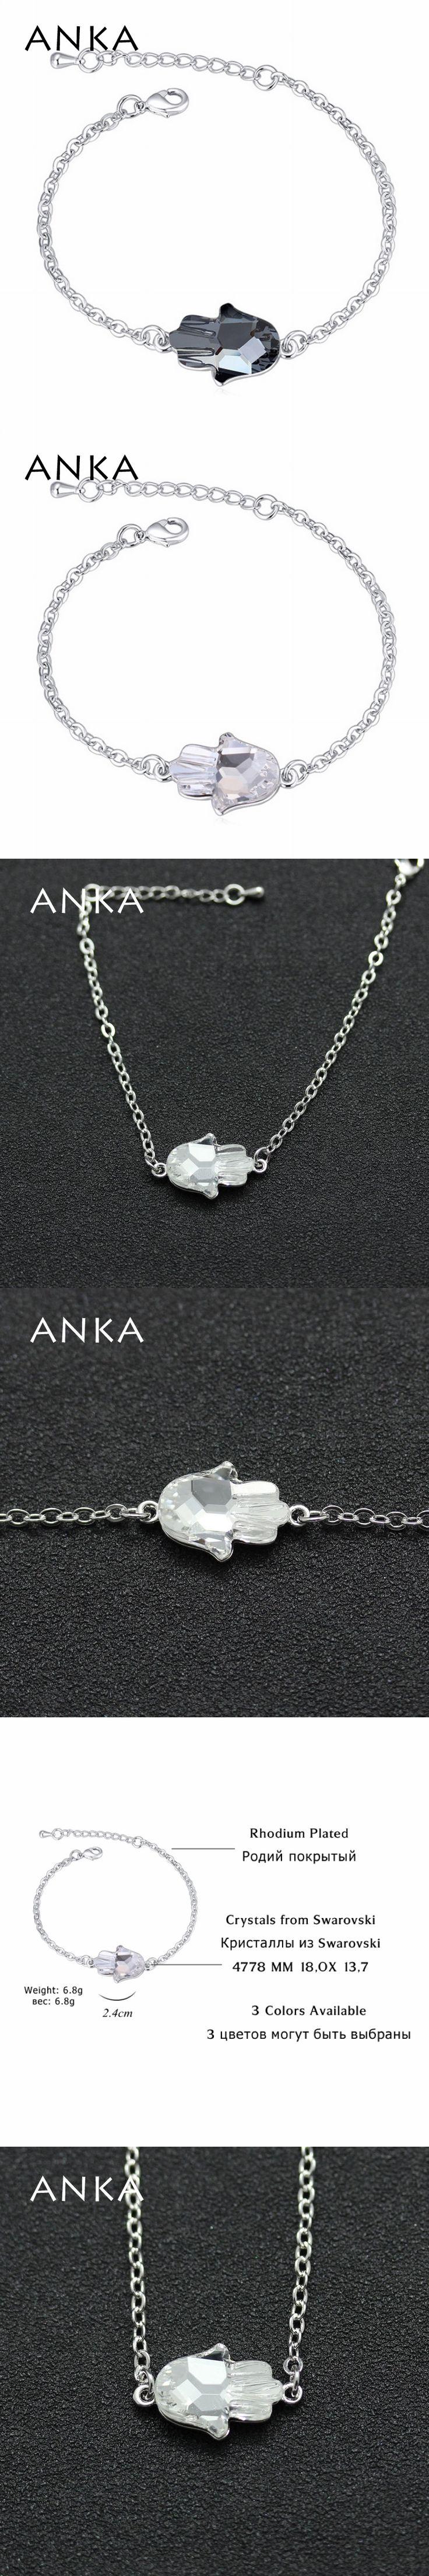 ANKA fatima hand crystal bracelet high quality charm jewelry gift Crystals from Swarovski originales 2017 for women #114553